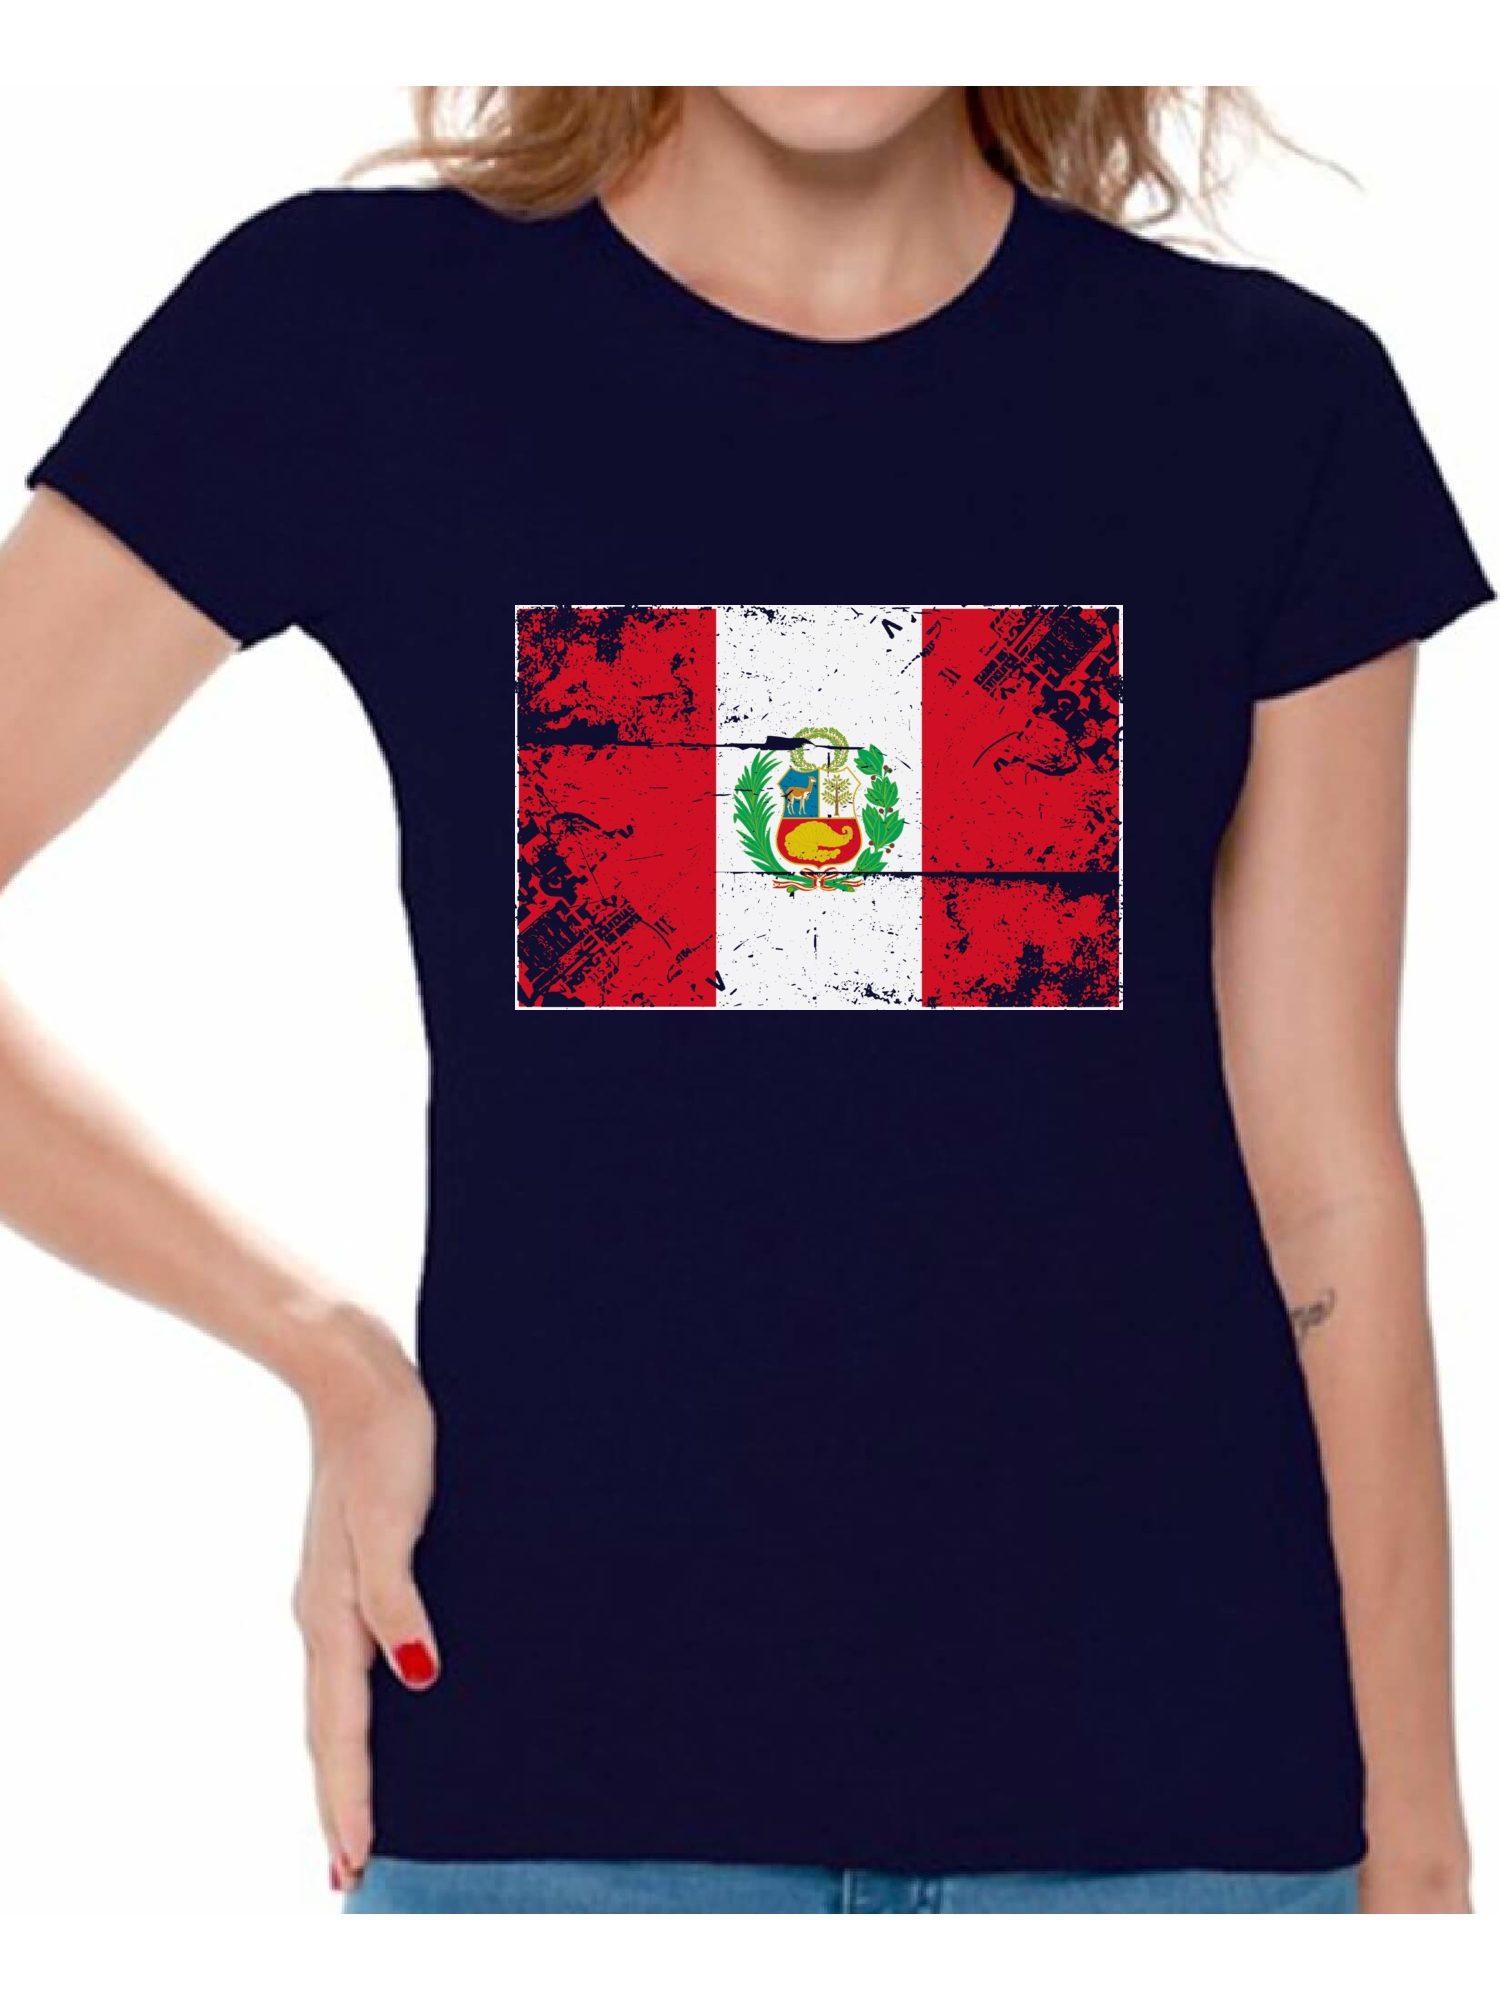 Awkward Styles Peru Flag Shirt for Women Peruvian Soccer 2018 Tshirt Gifts  from Peru Flag of Peru Peruvian Women Peru Shirts for Women Peru 2018 Tshirt  ... 3f7adc1ba1